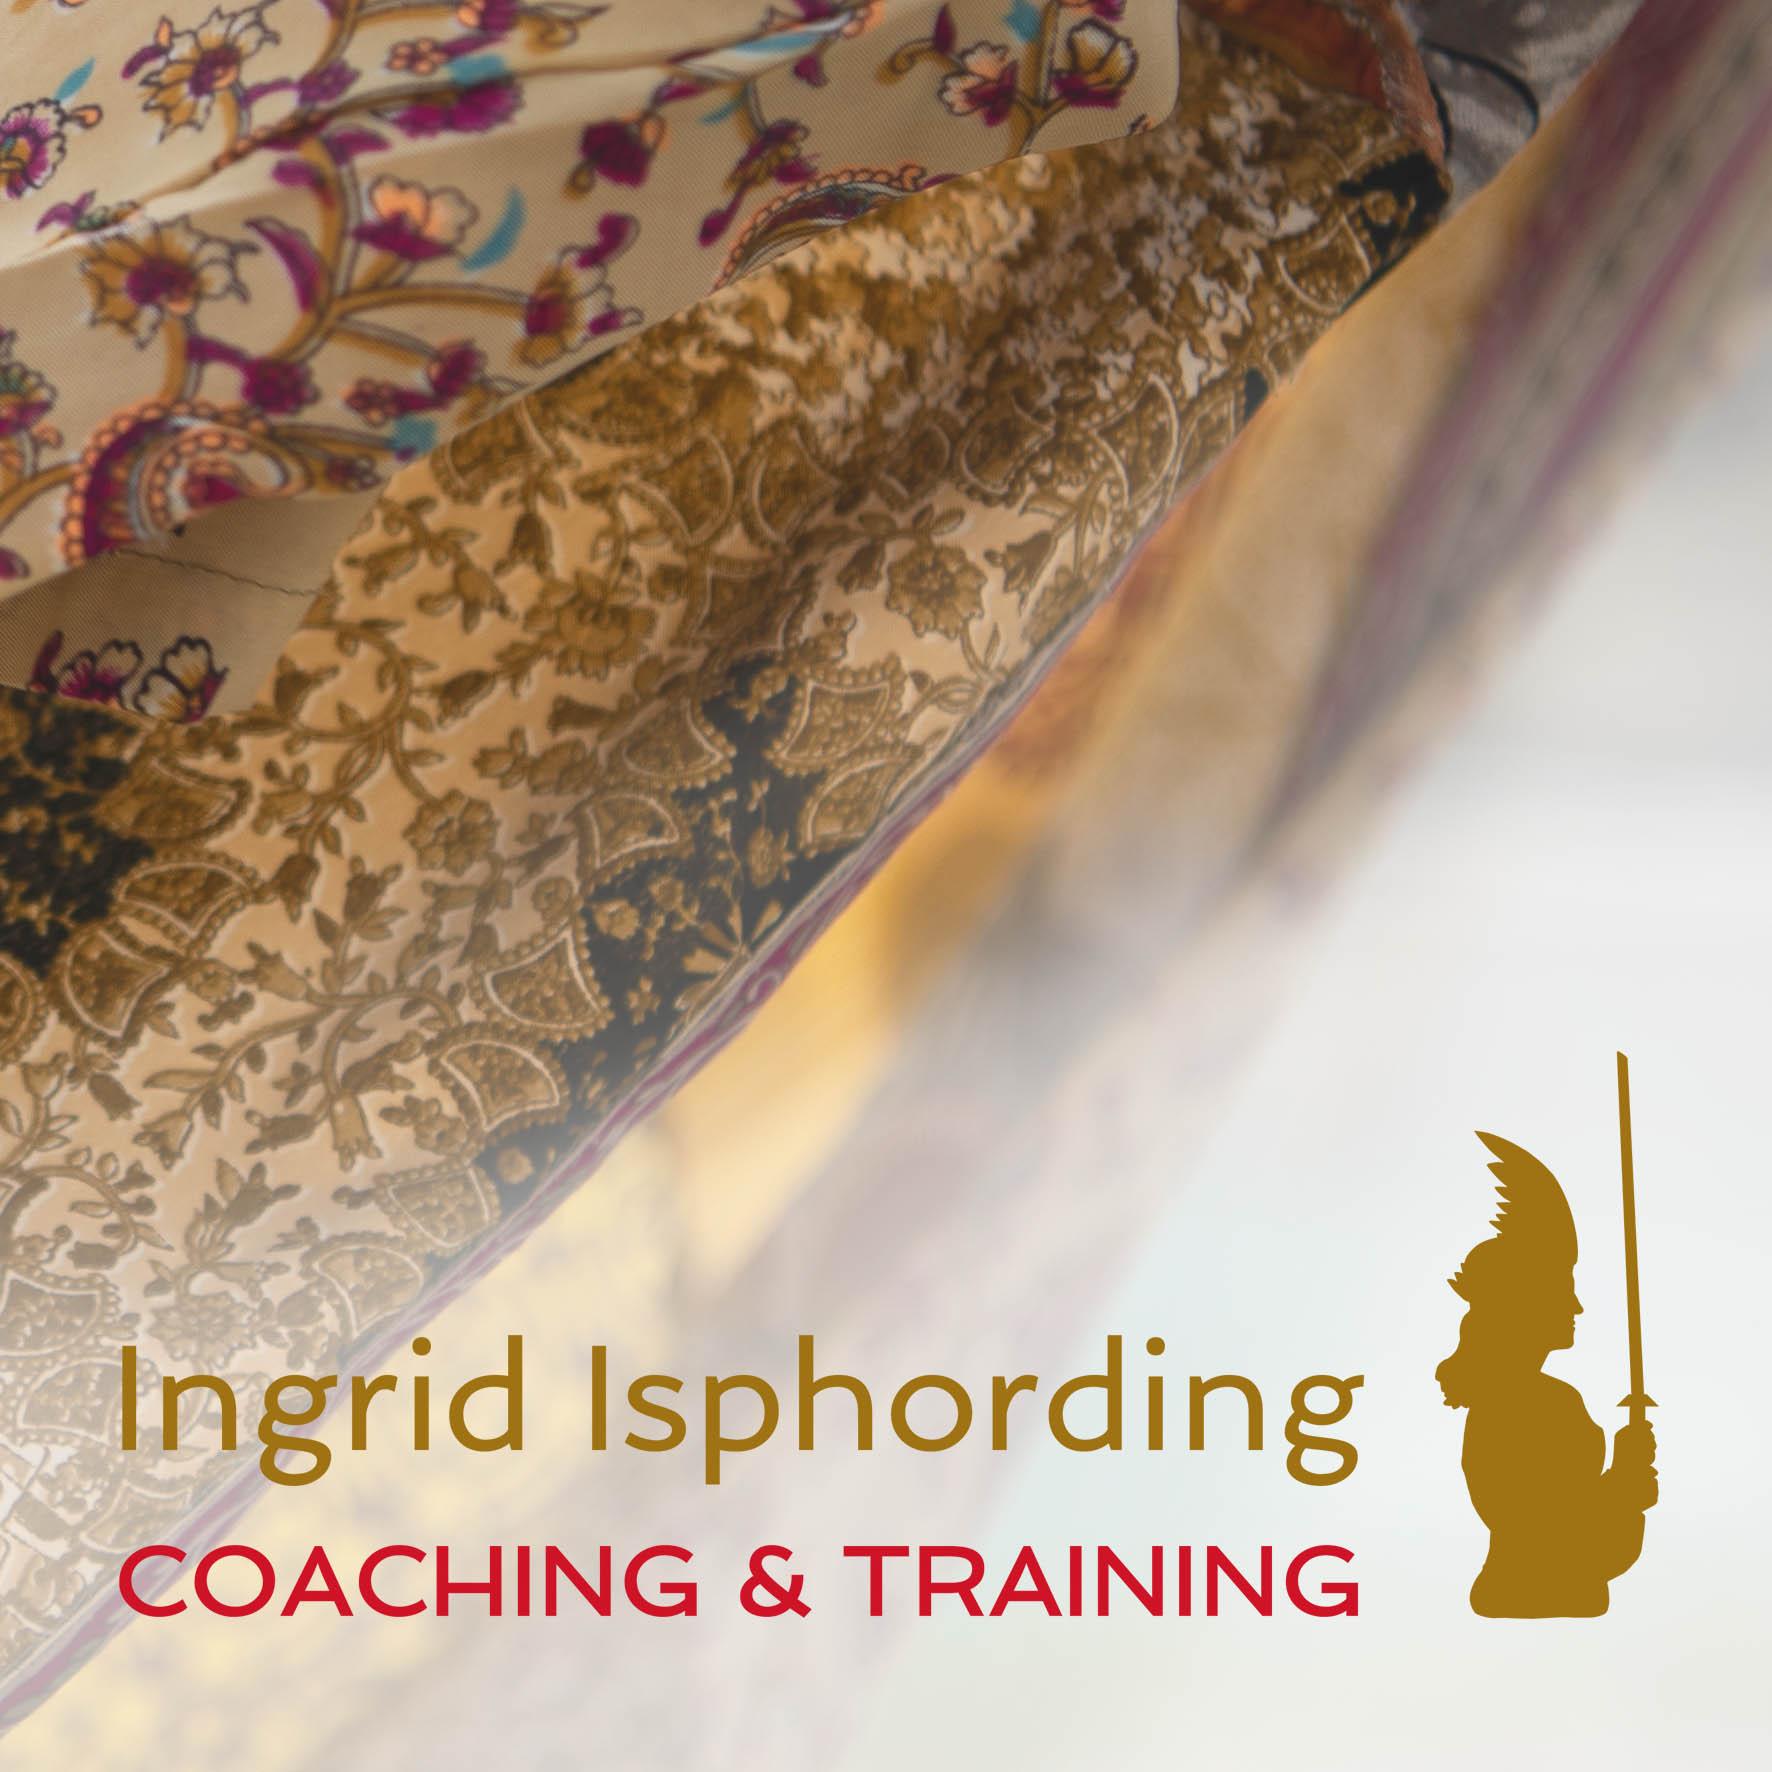 INGRID ISPHORDING